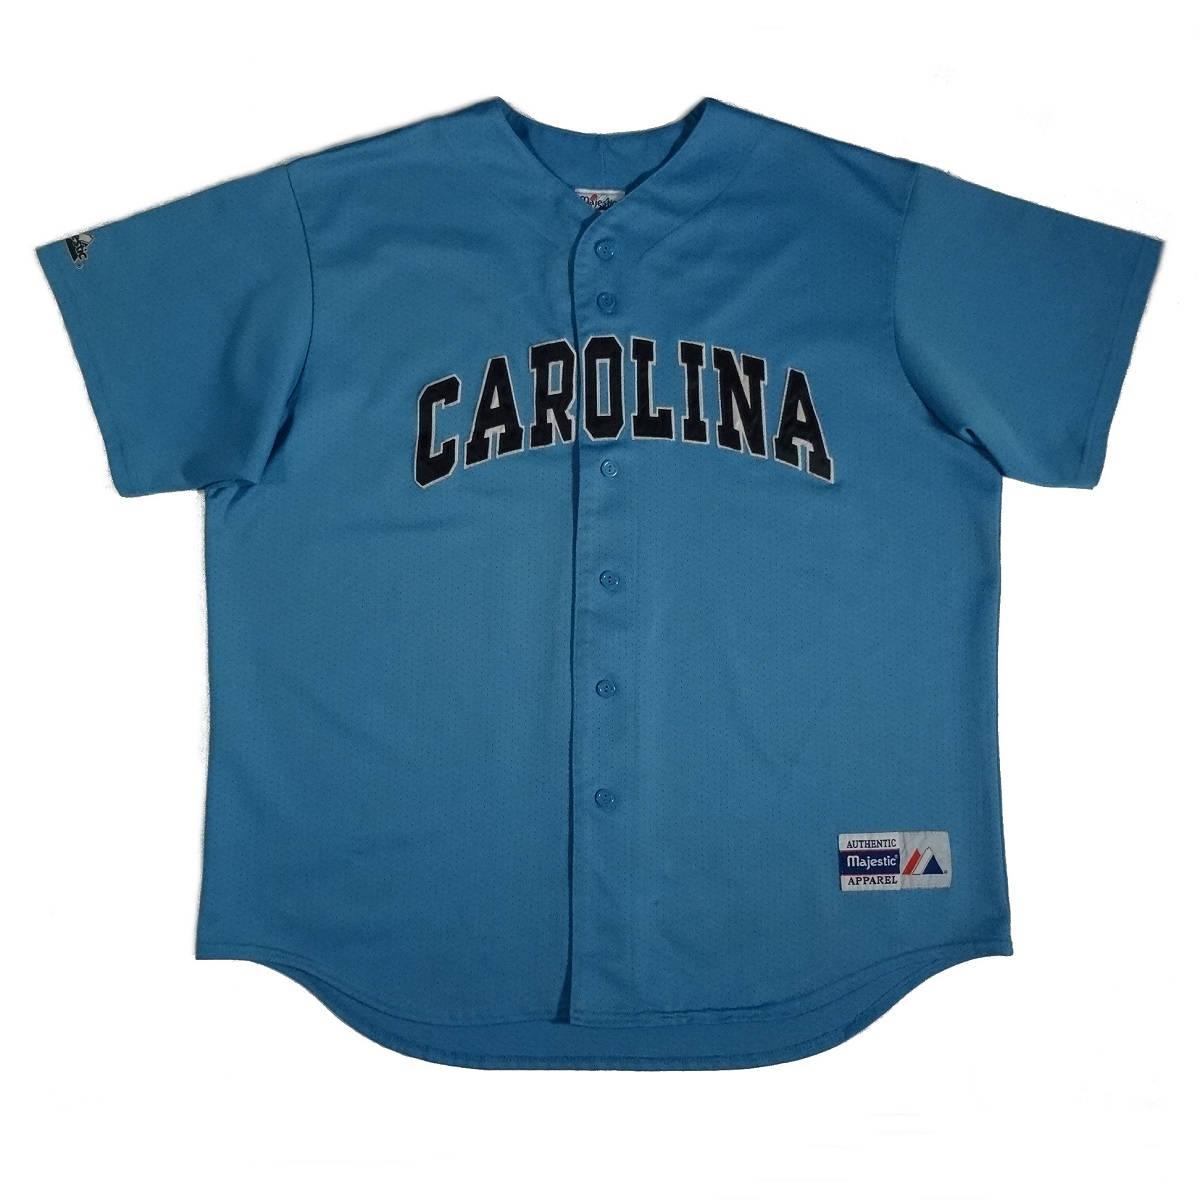 north carolina tar heels baseball jersey vintage majestic front